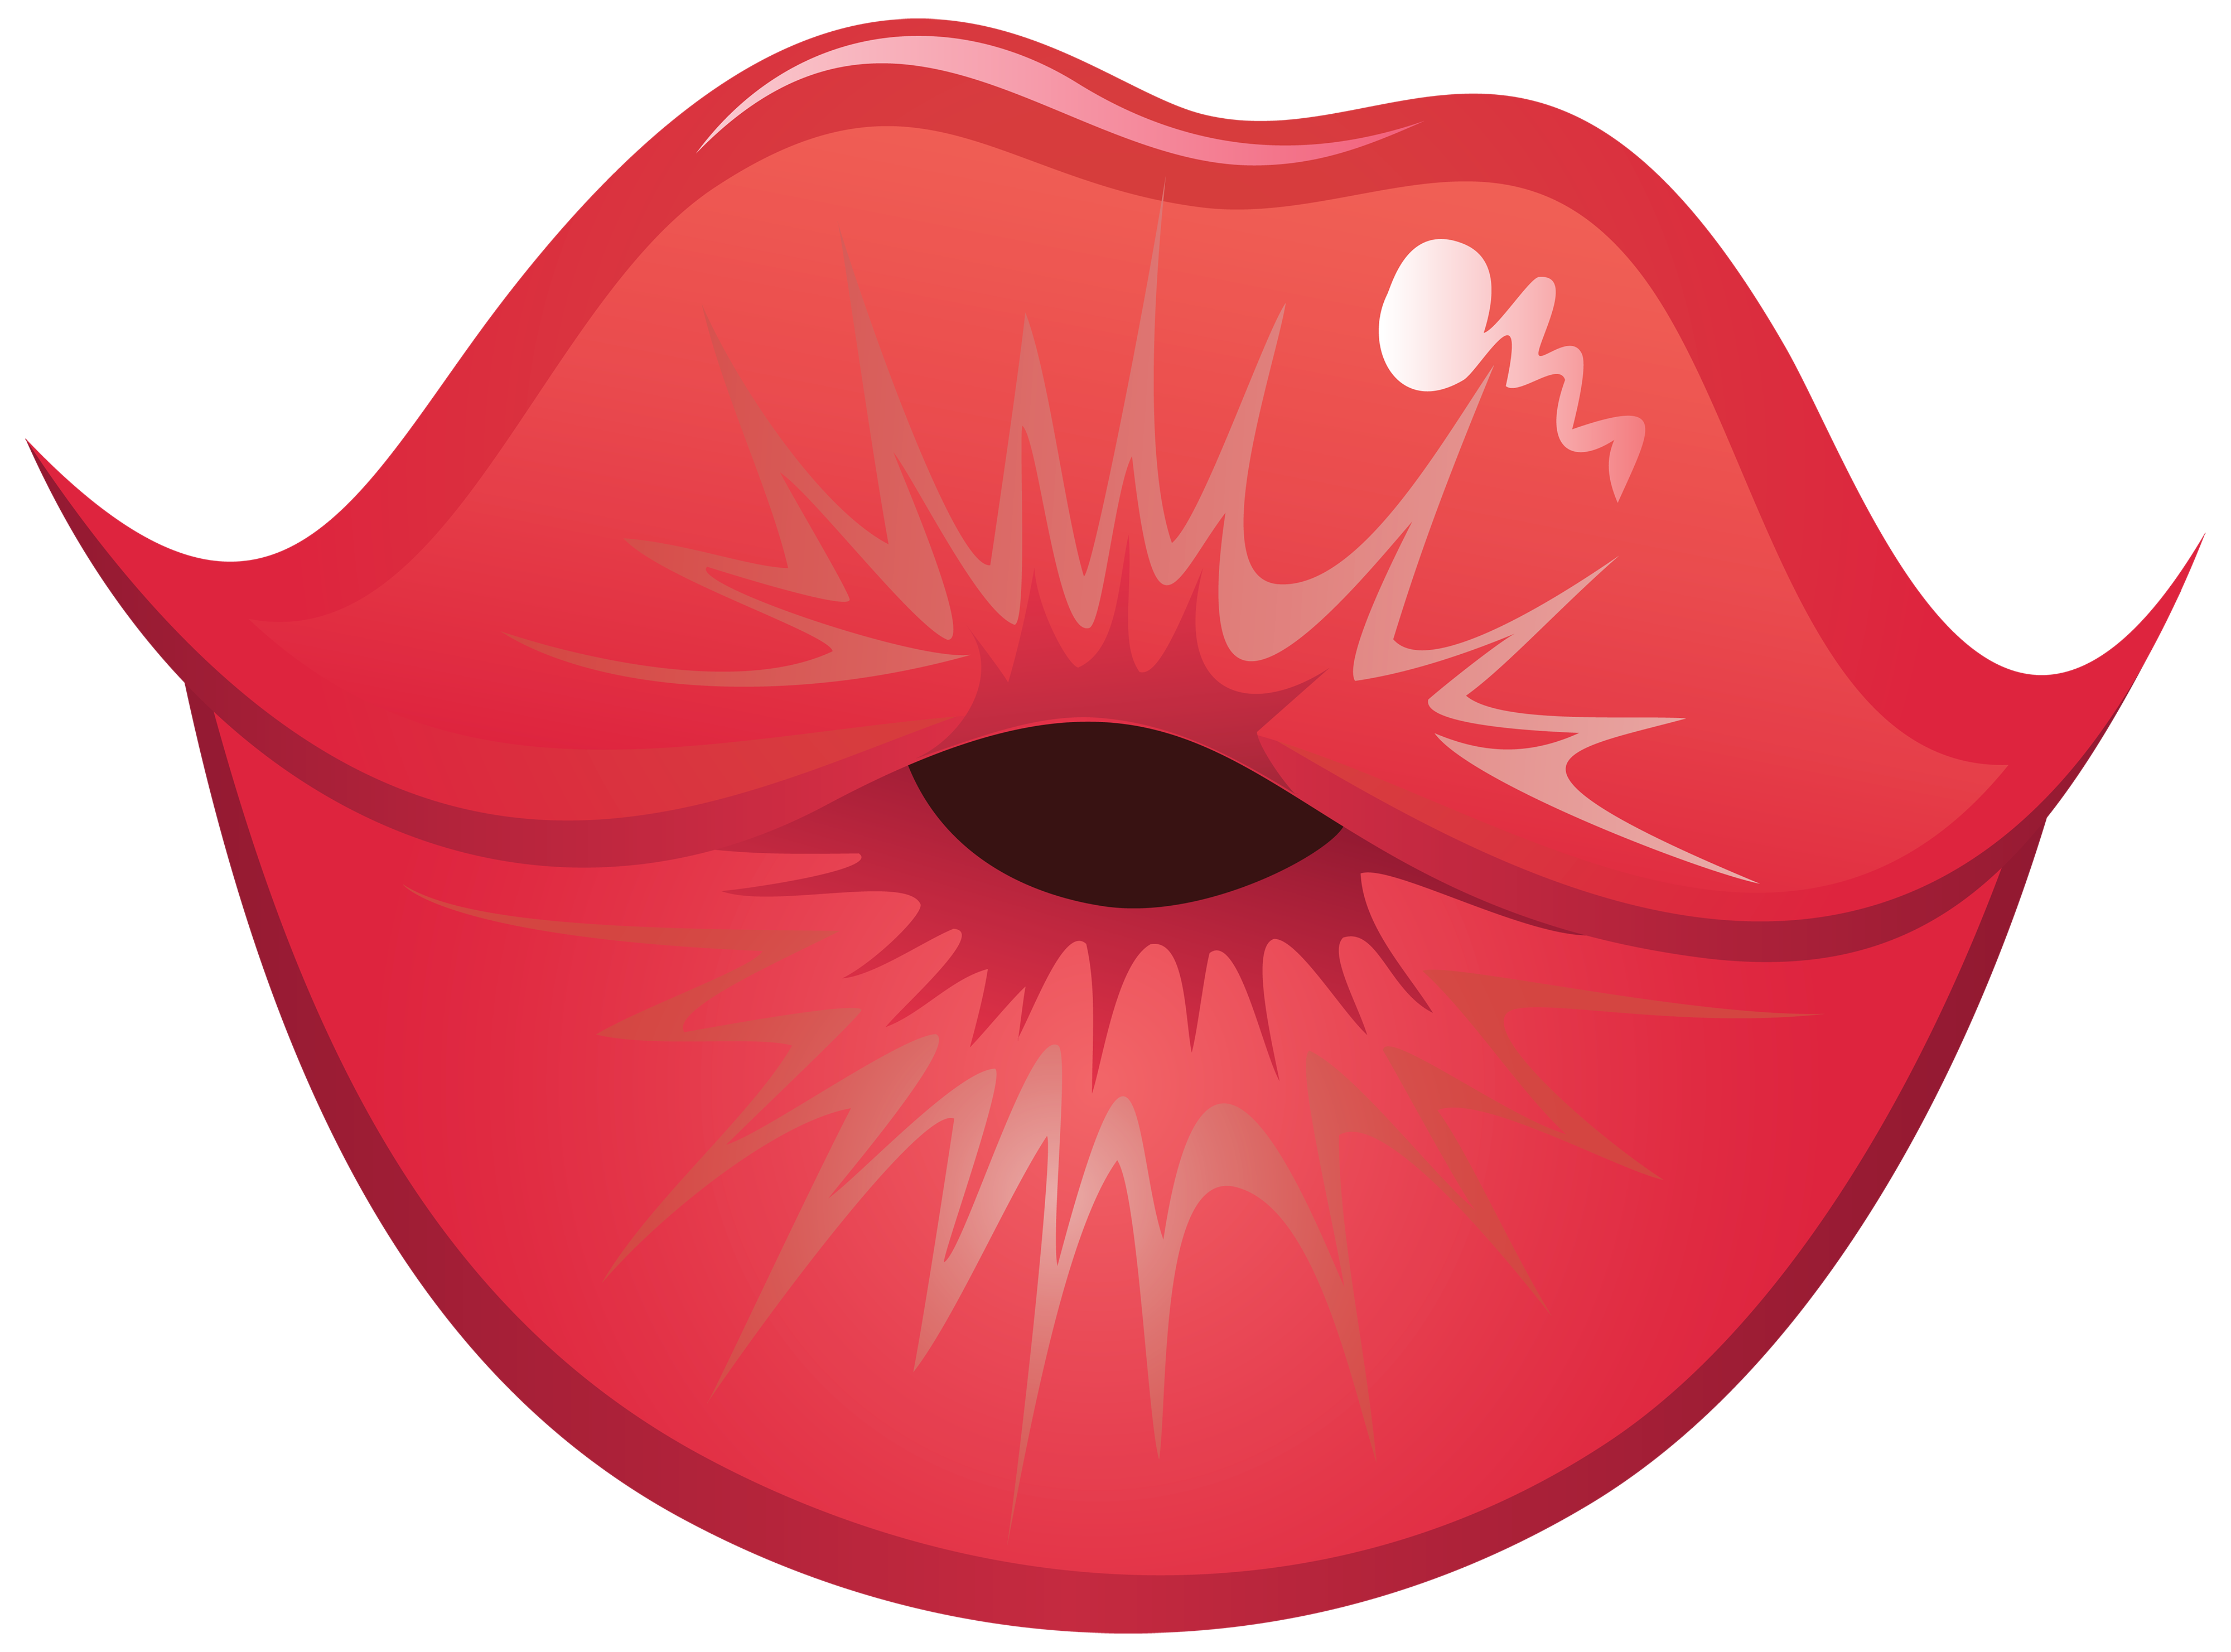 4000x2962 Kiss Lips Clipart, Explore Pictures